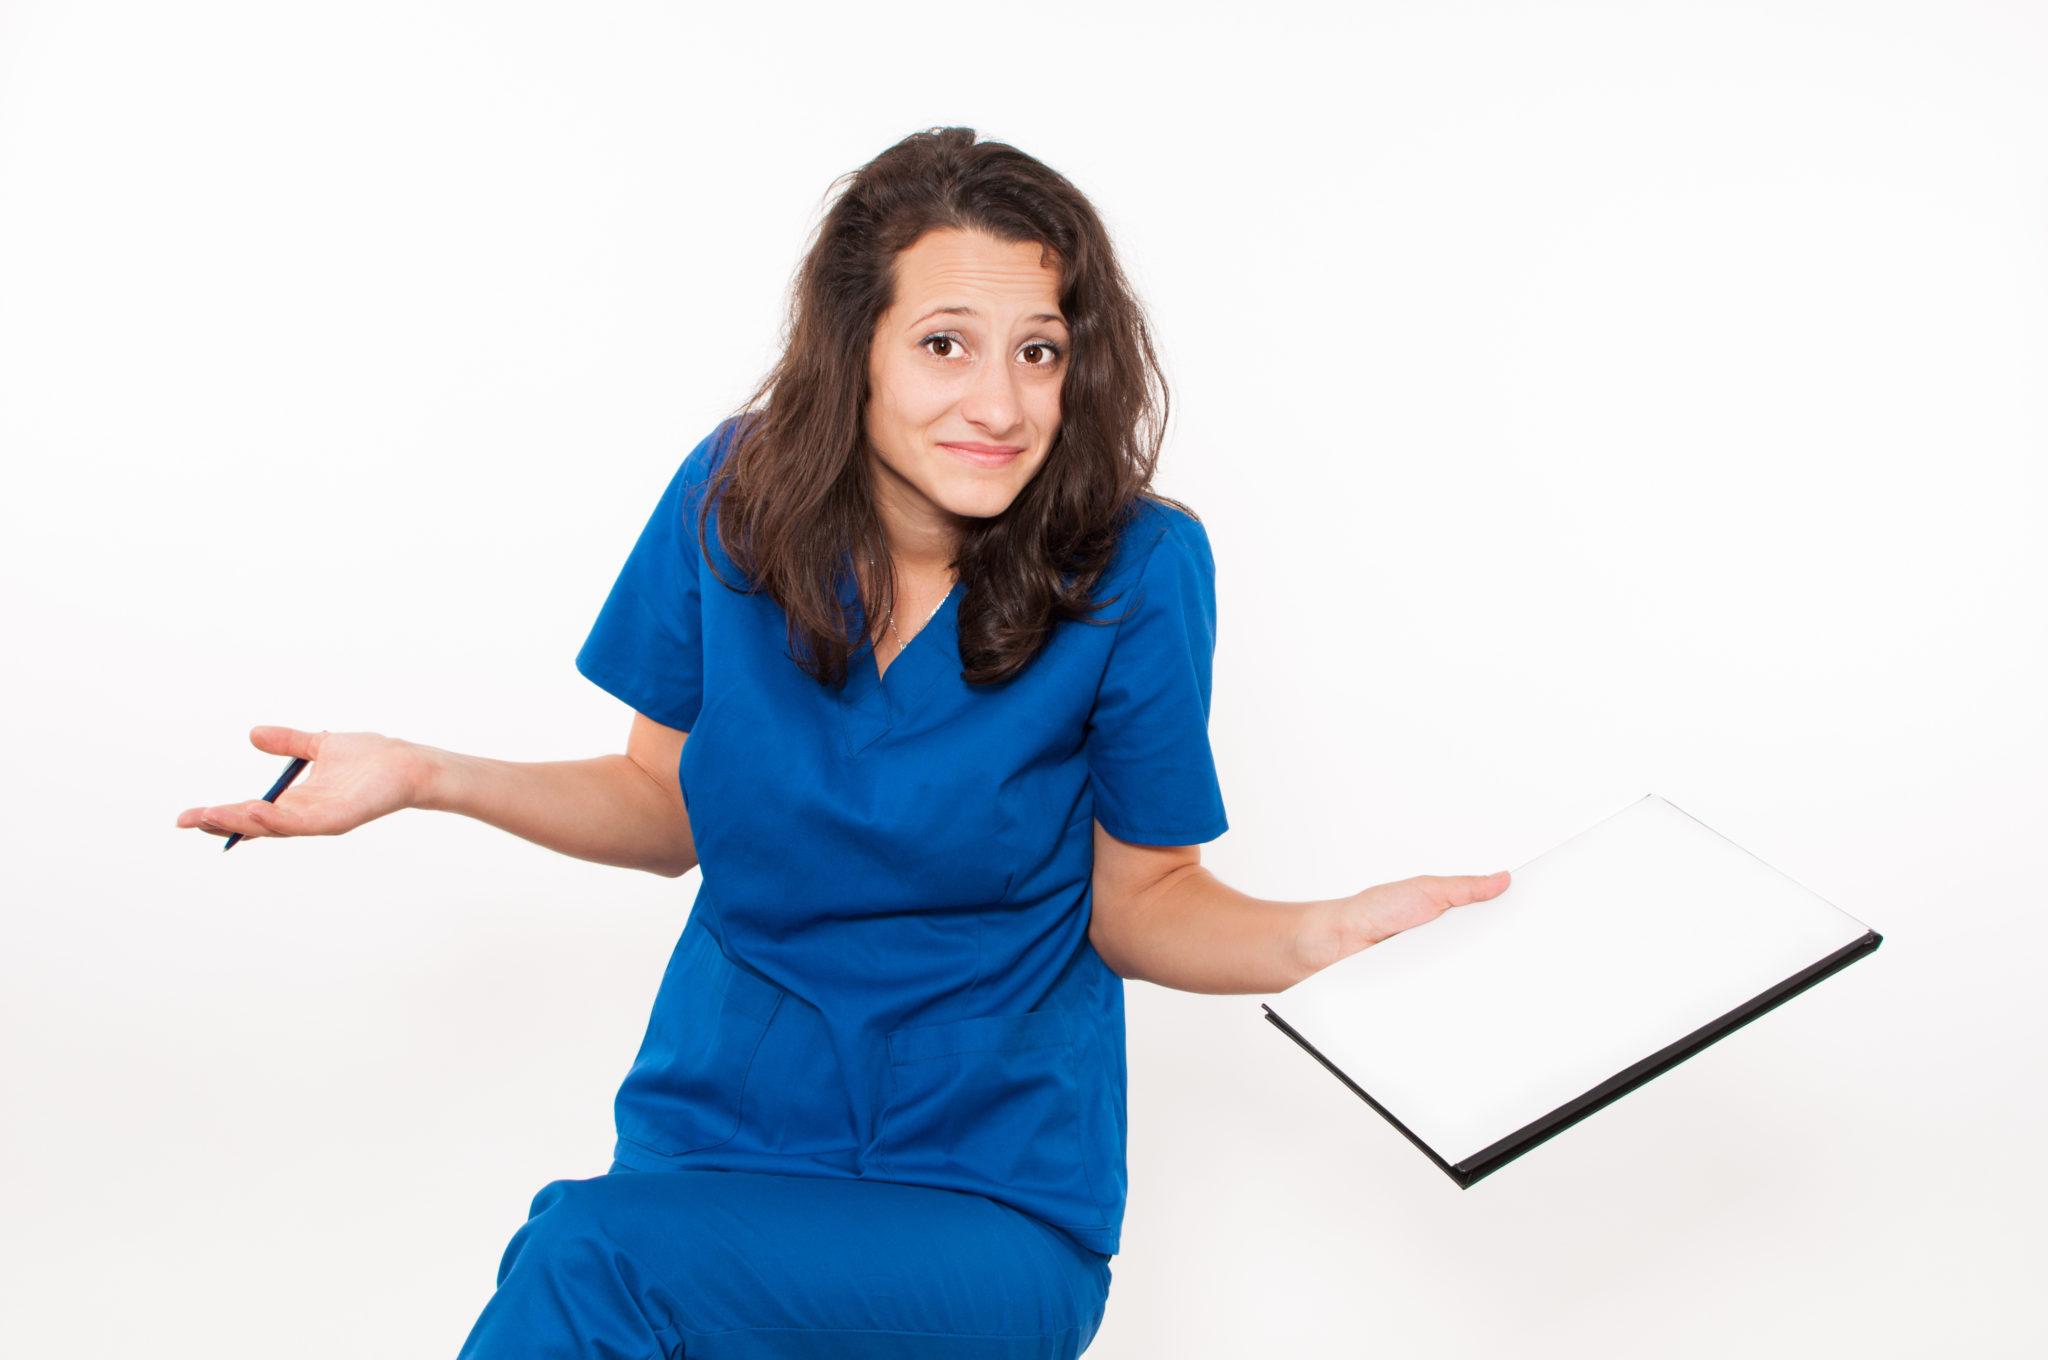 Puzzled Travel Nurse